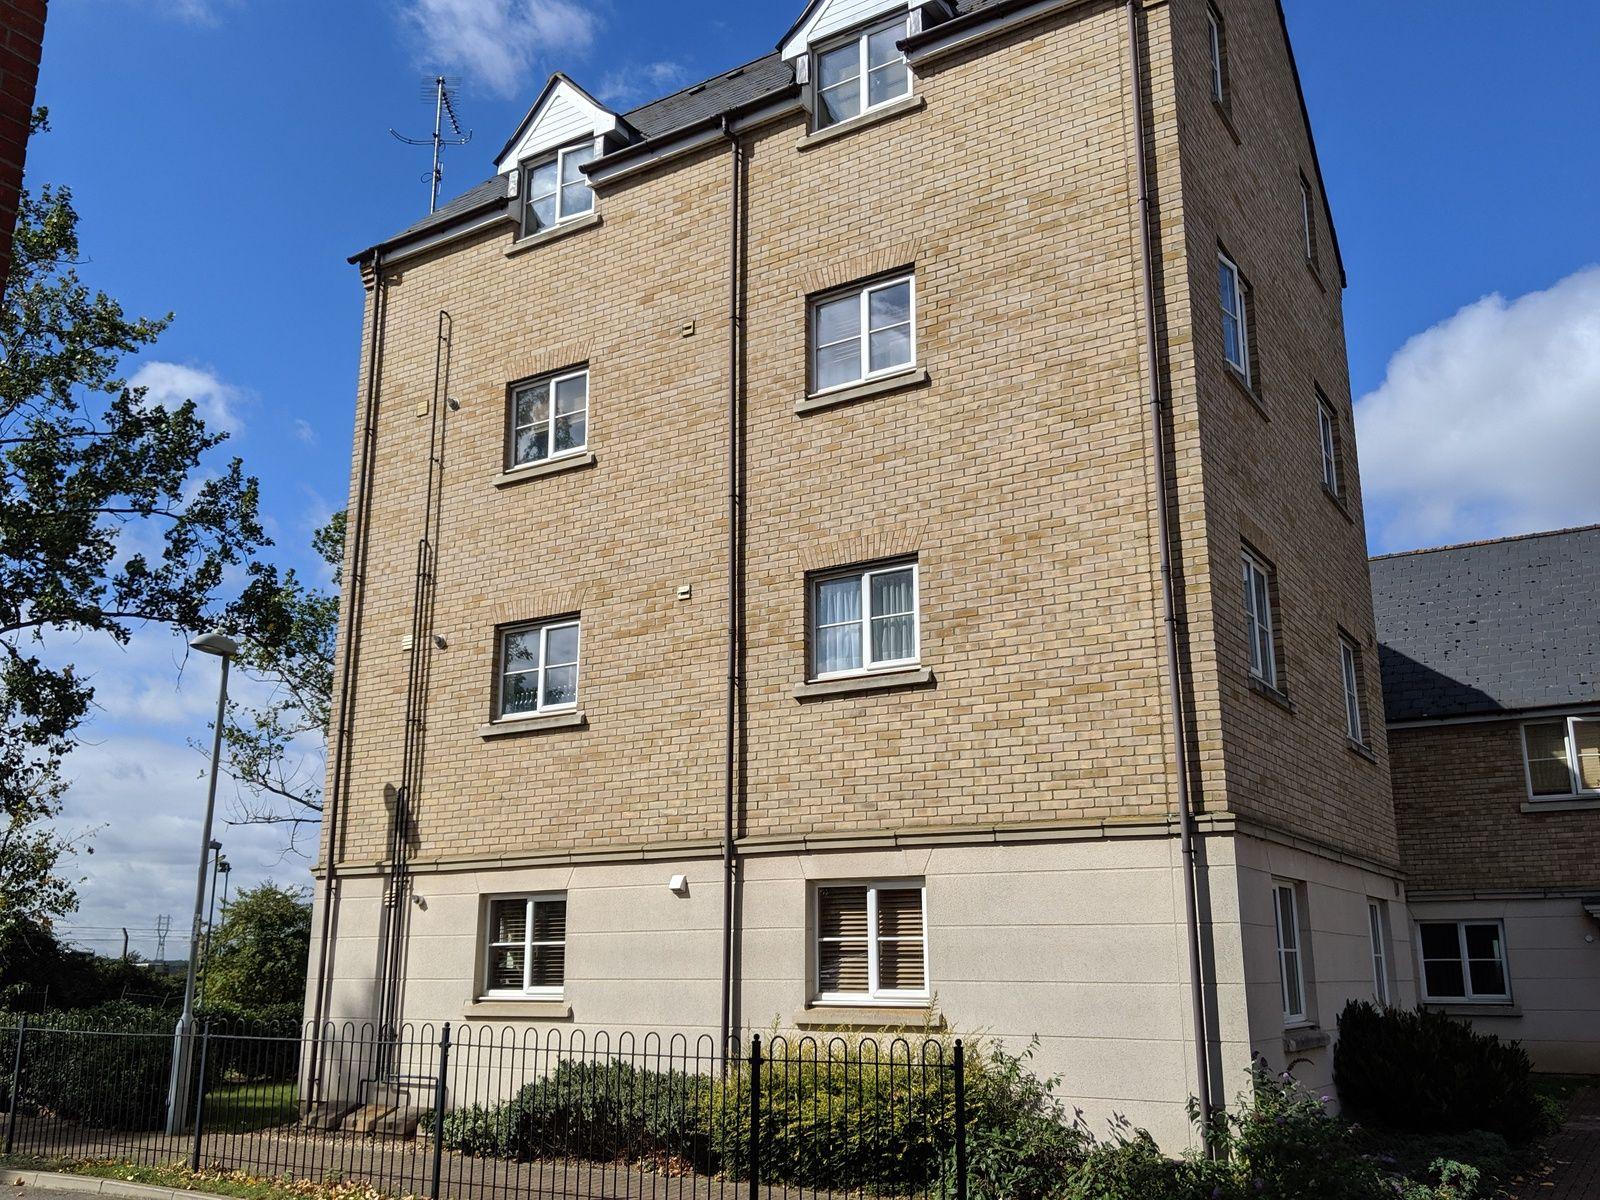 2 bedroom ground floor flat/apartment To Let in Ipswich - Photograph 1